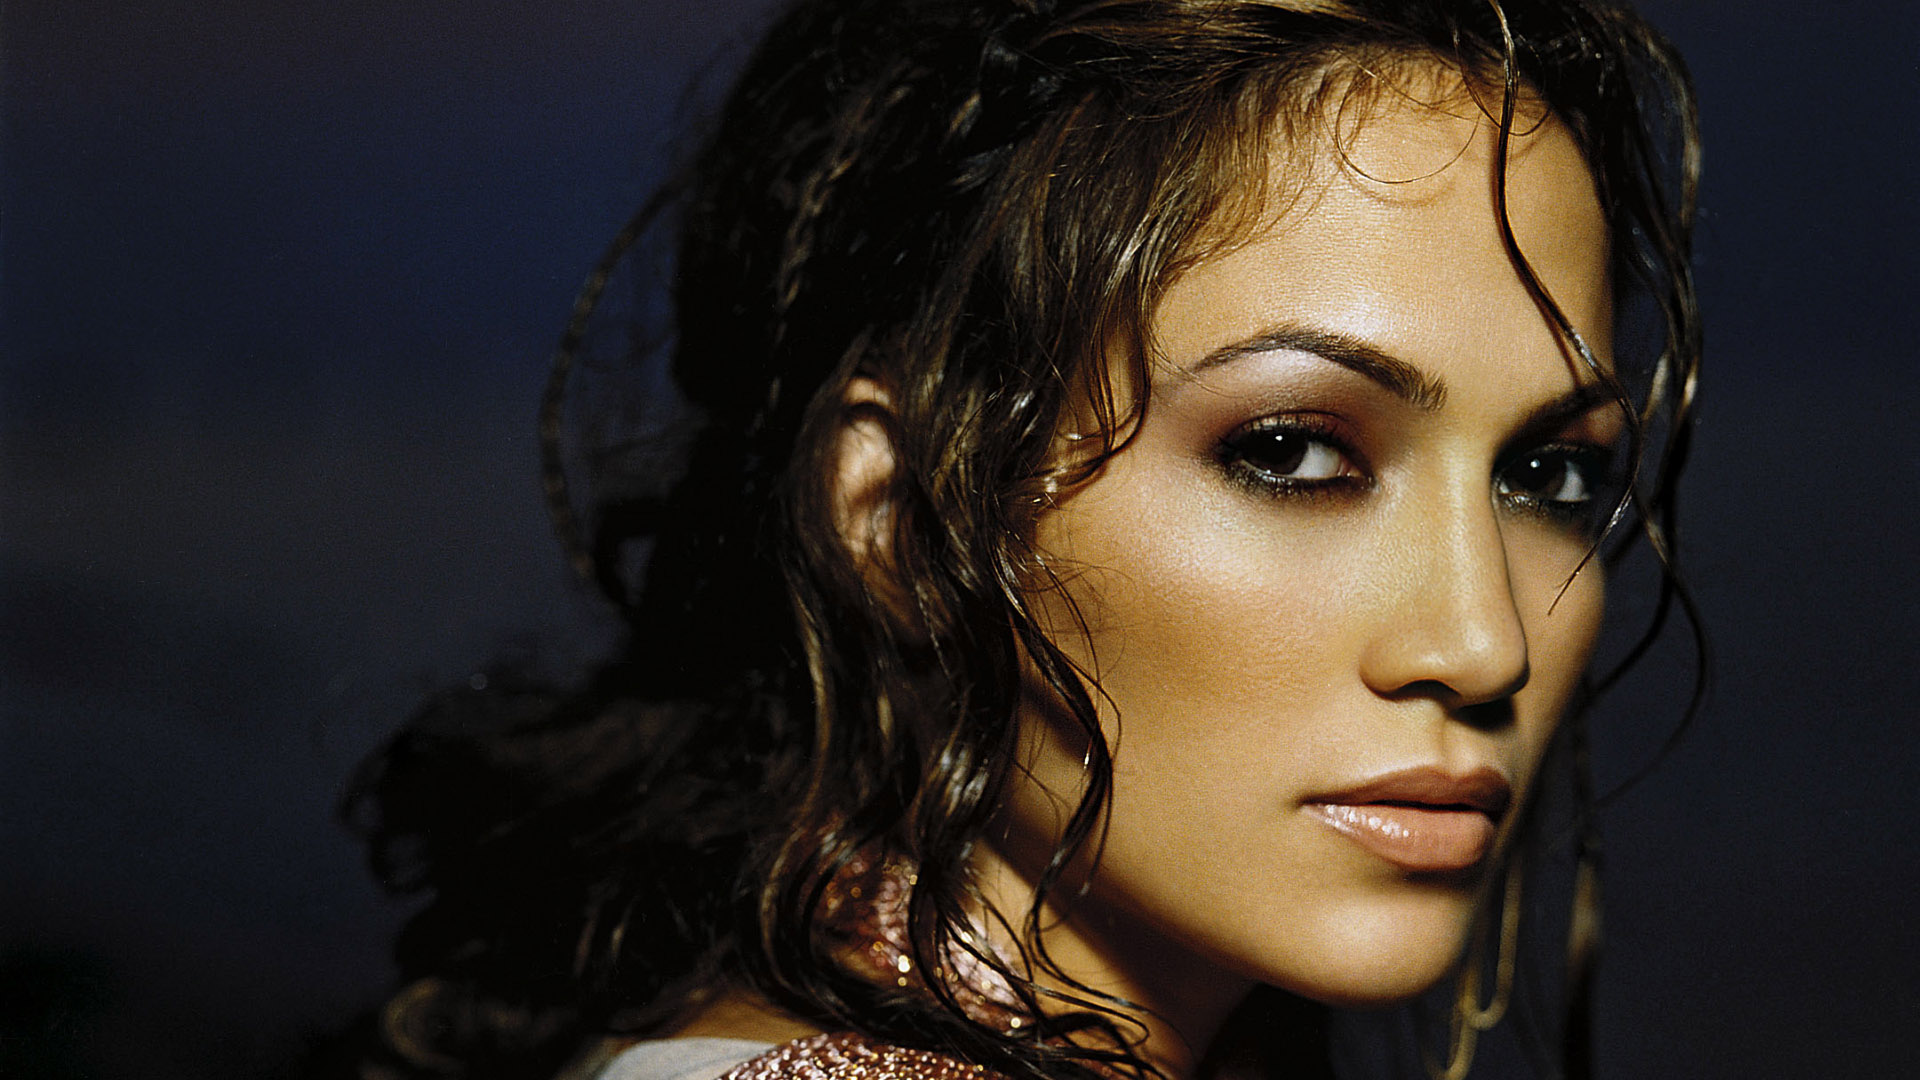 Jennifer Lopez Wallpaper 21